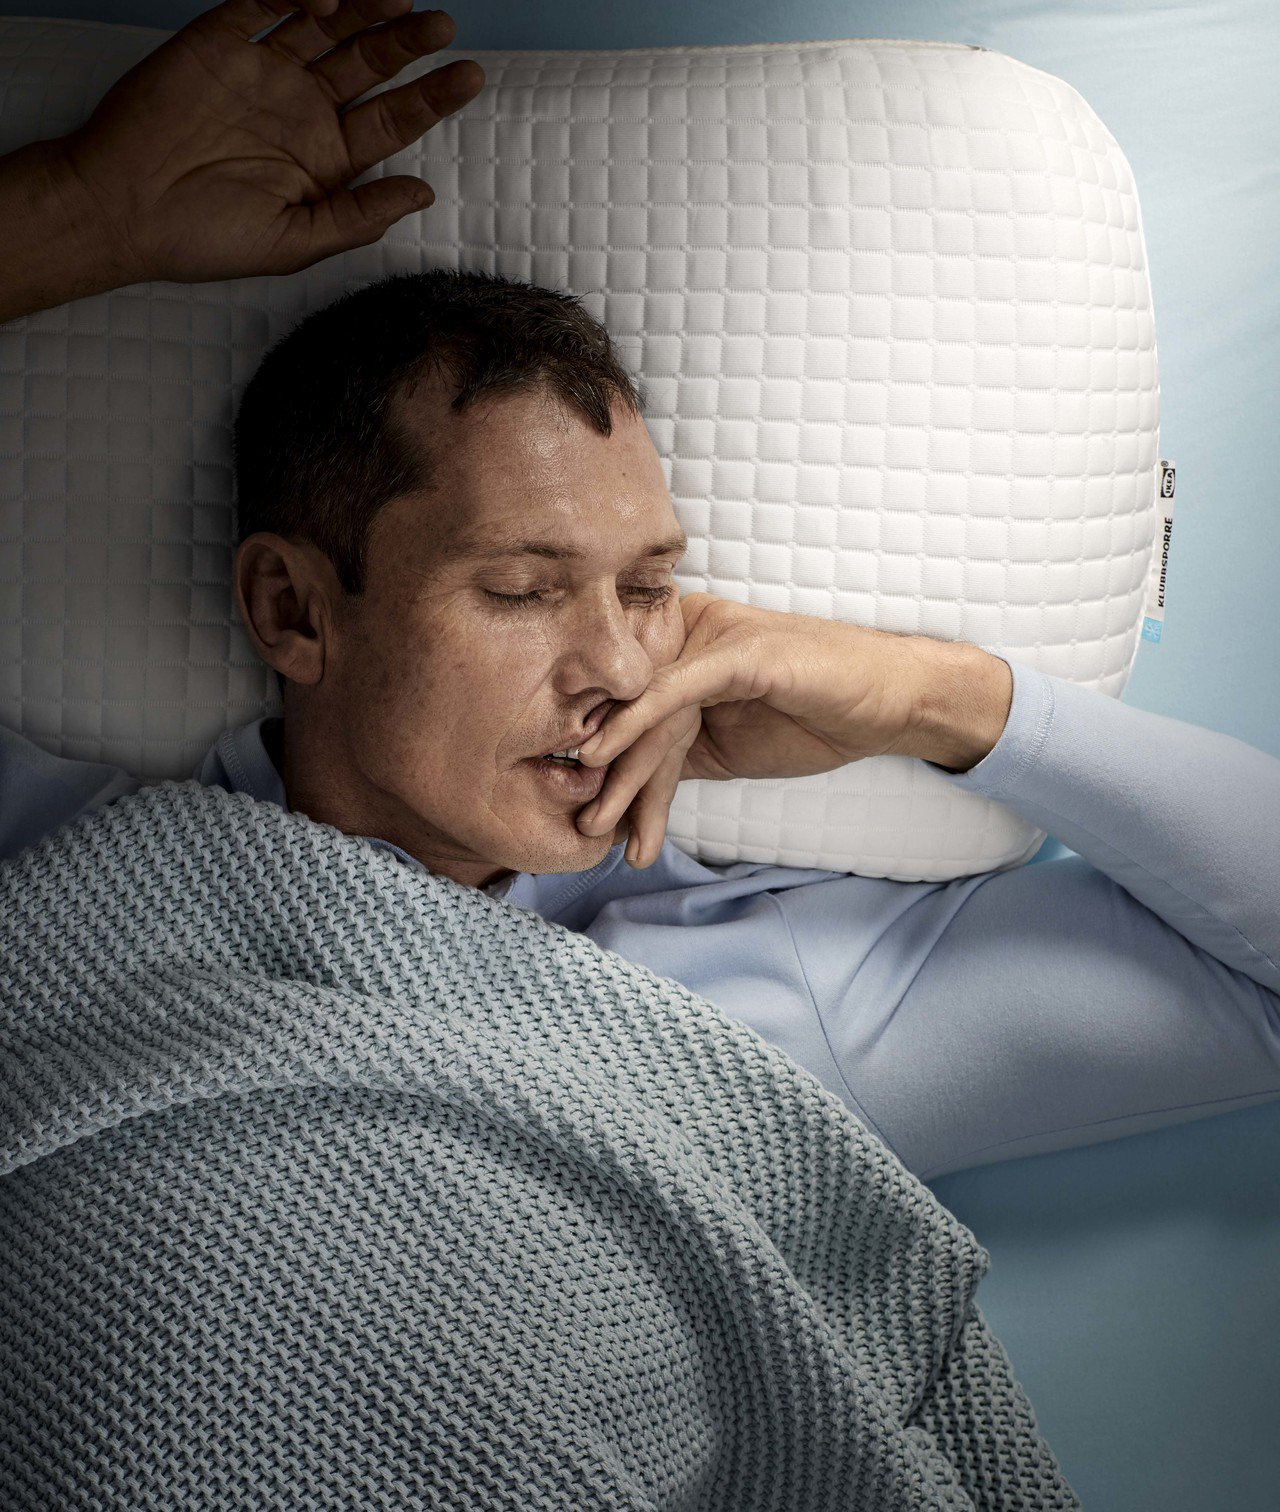 IKEA KLUBBSPORRE人體工學枕結合記憶泡棉與凝膠層,提供涼爽舒適表面...